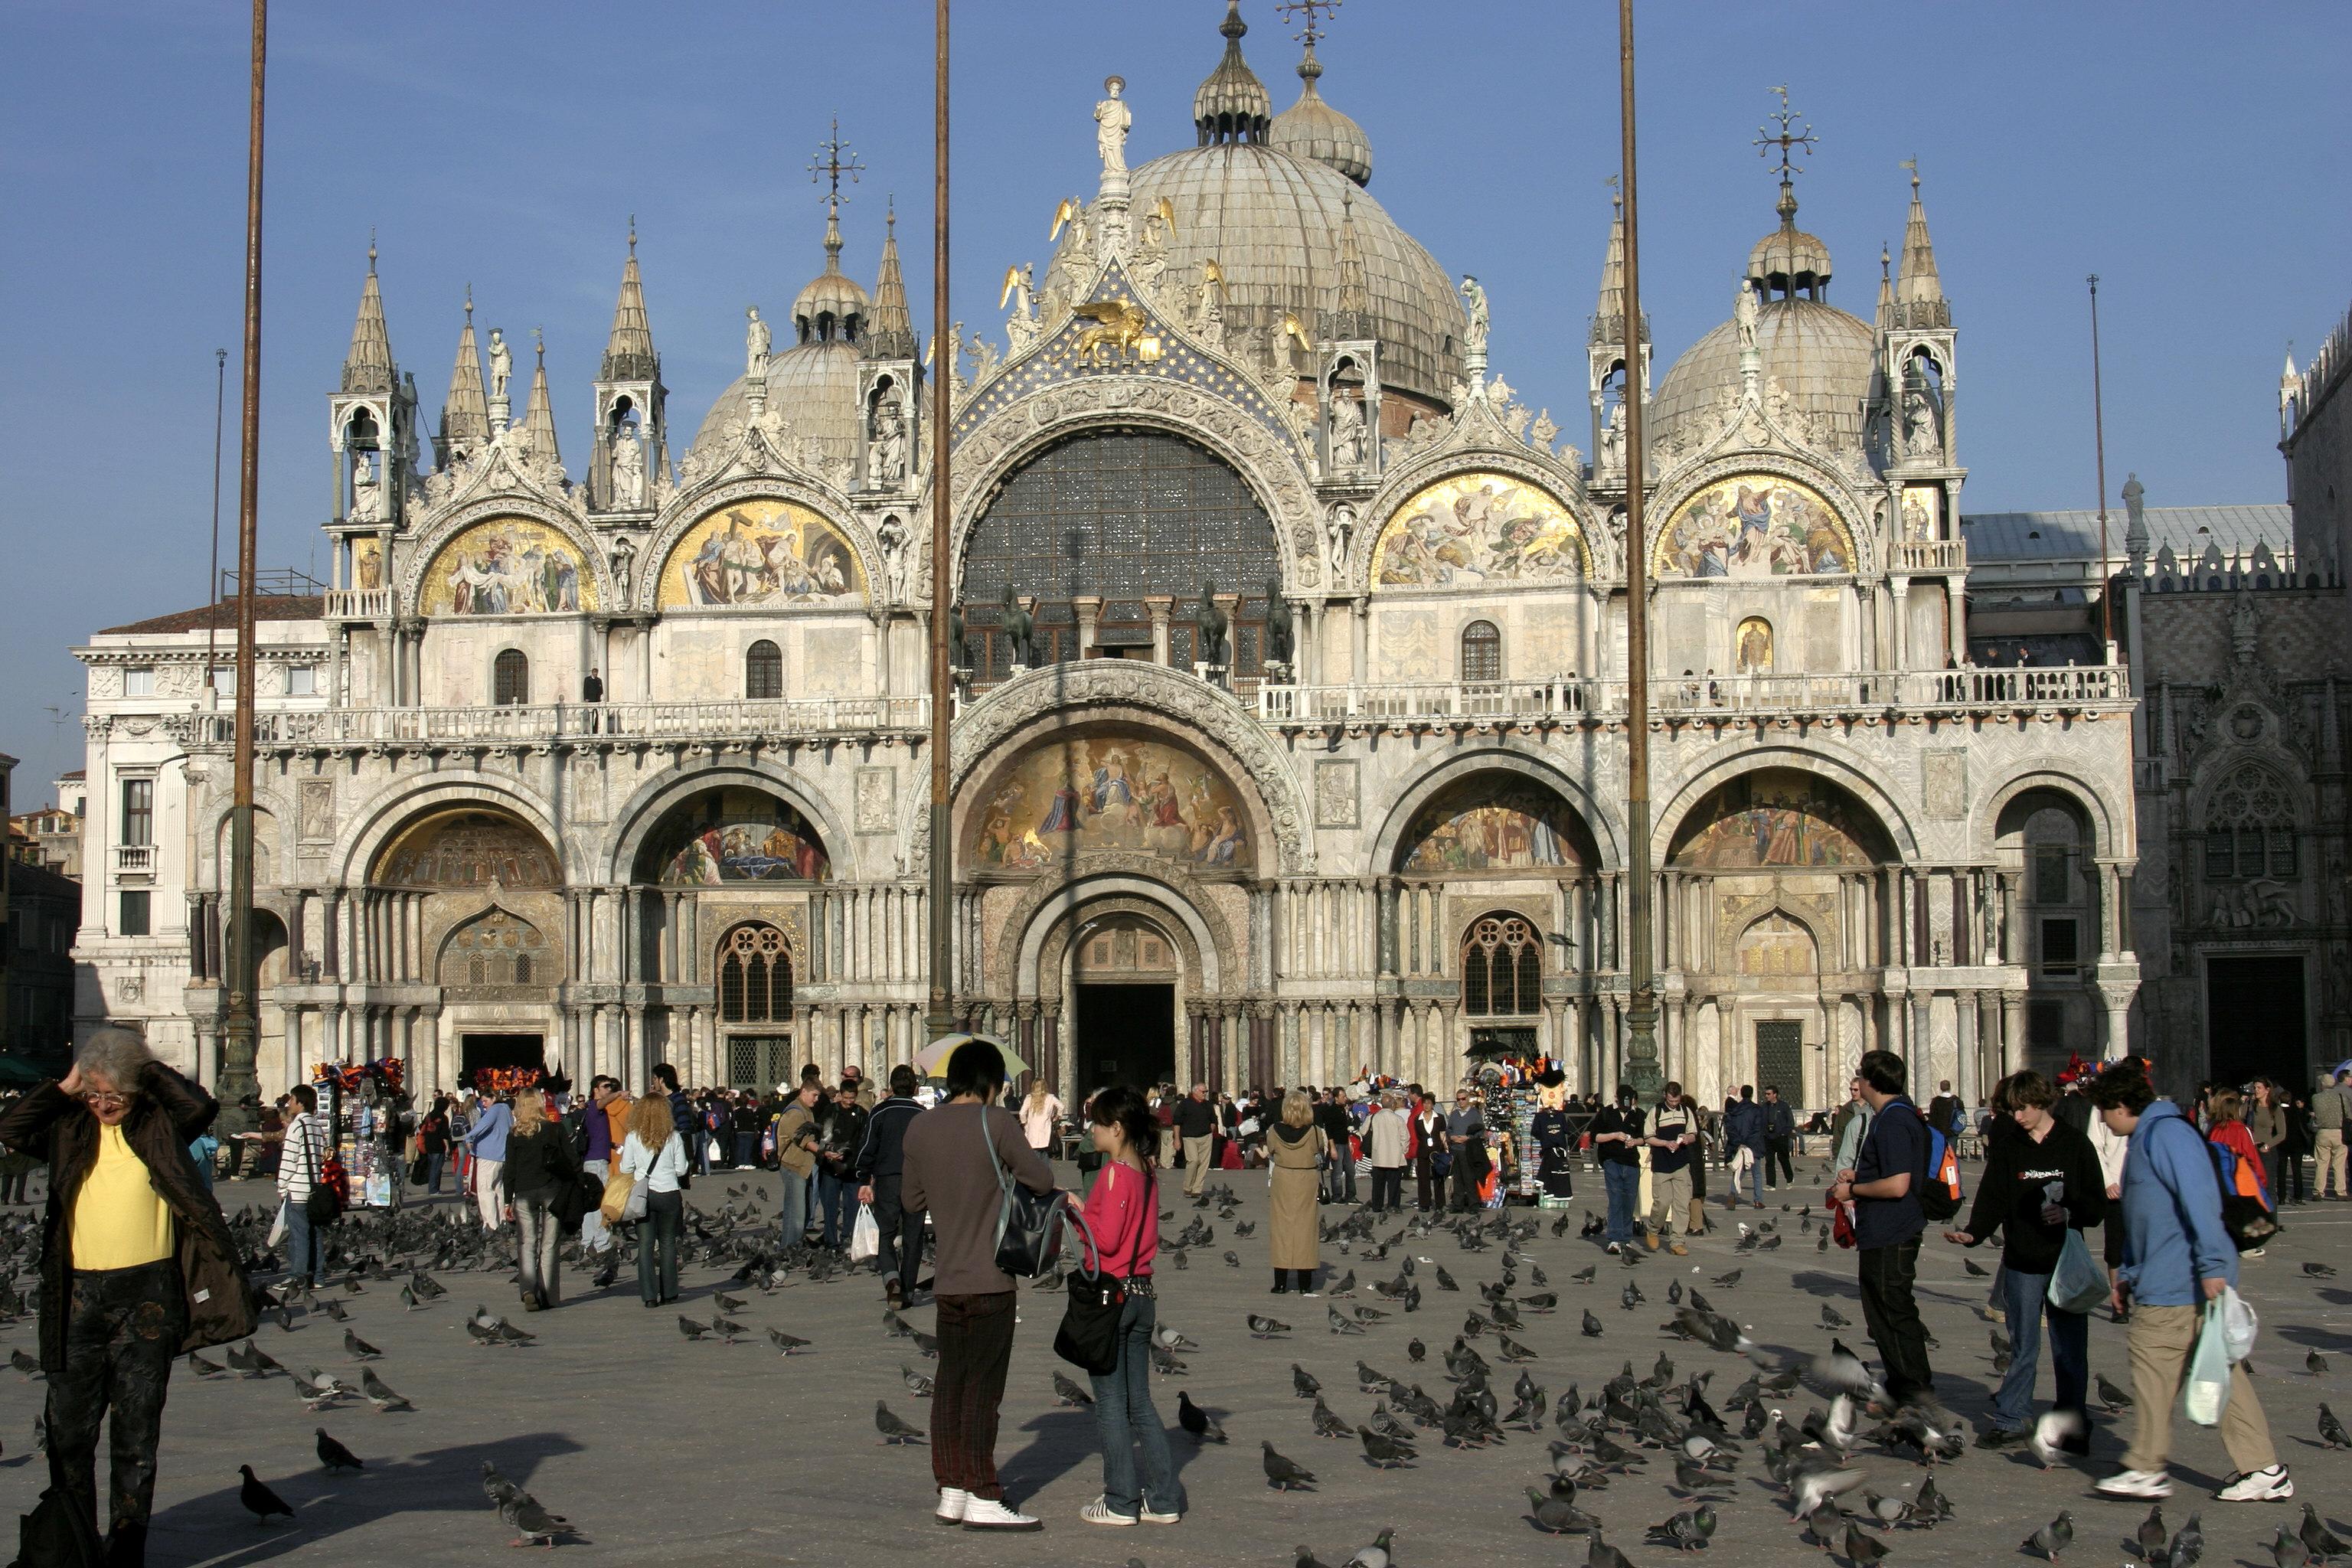 Venice_-_St._Marc%27s_Basilica_01.jpg